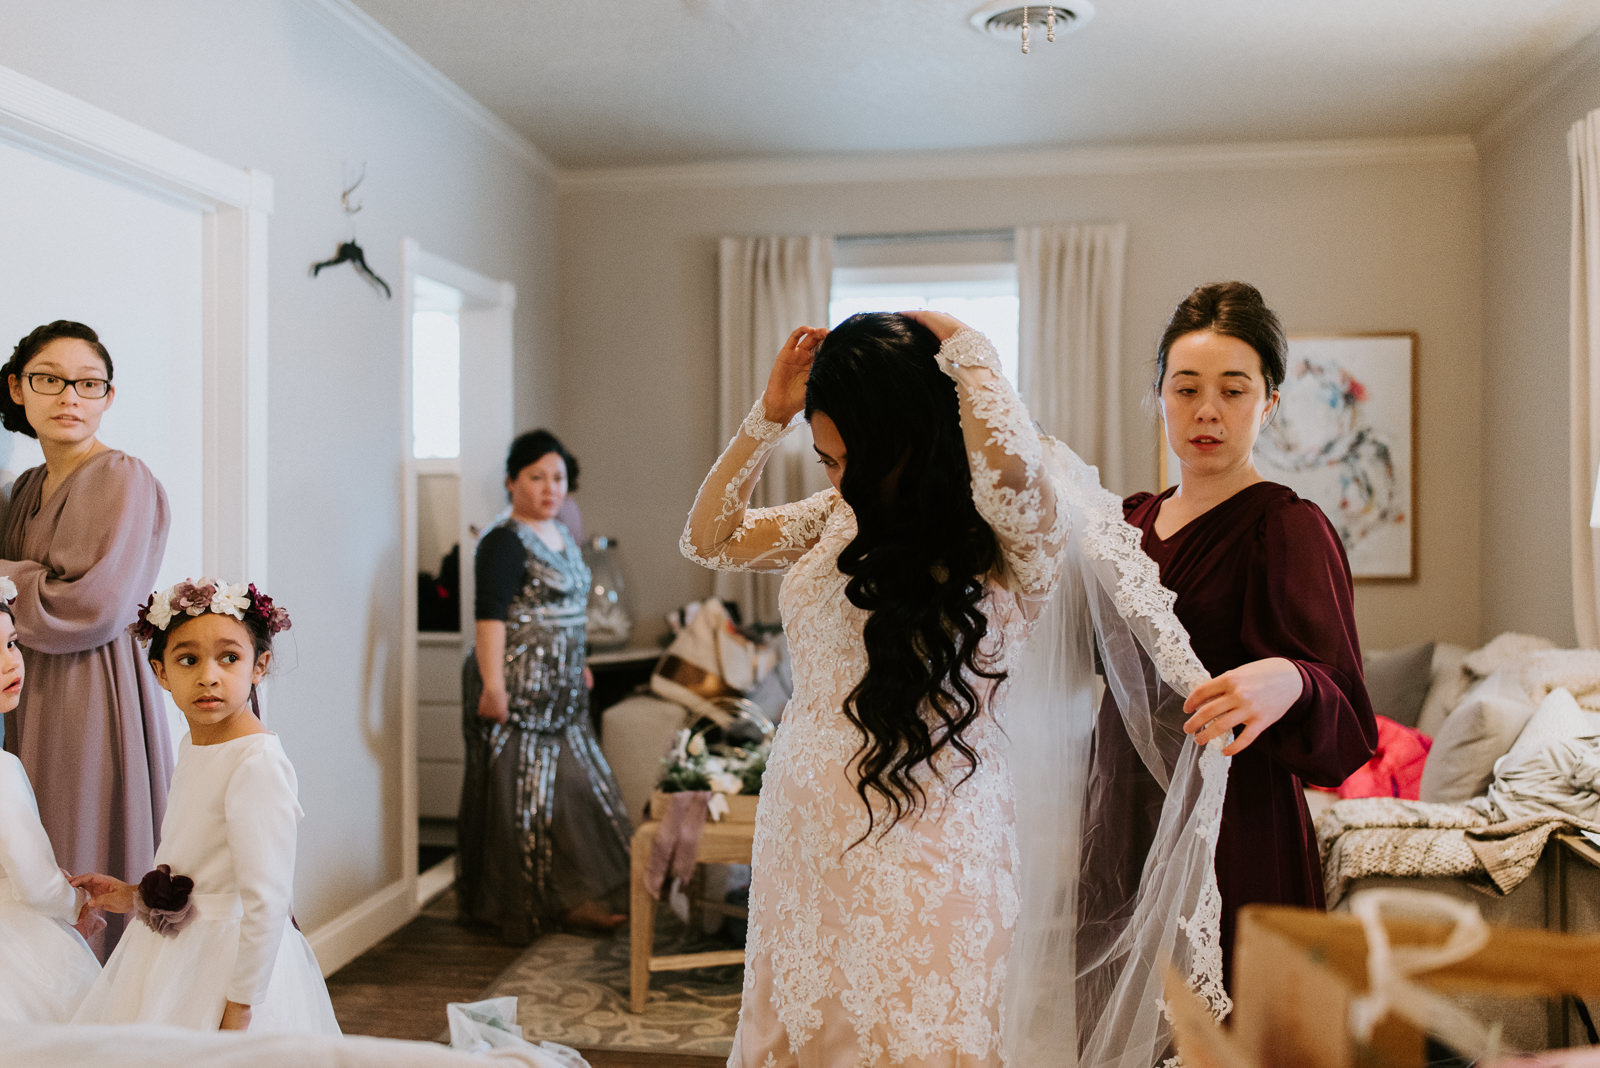 maid of honor puts on brides veil